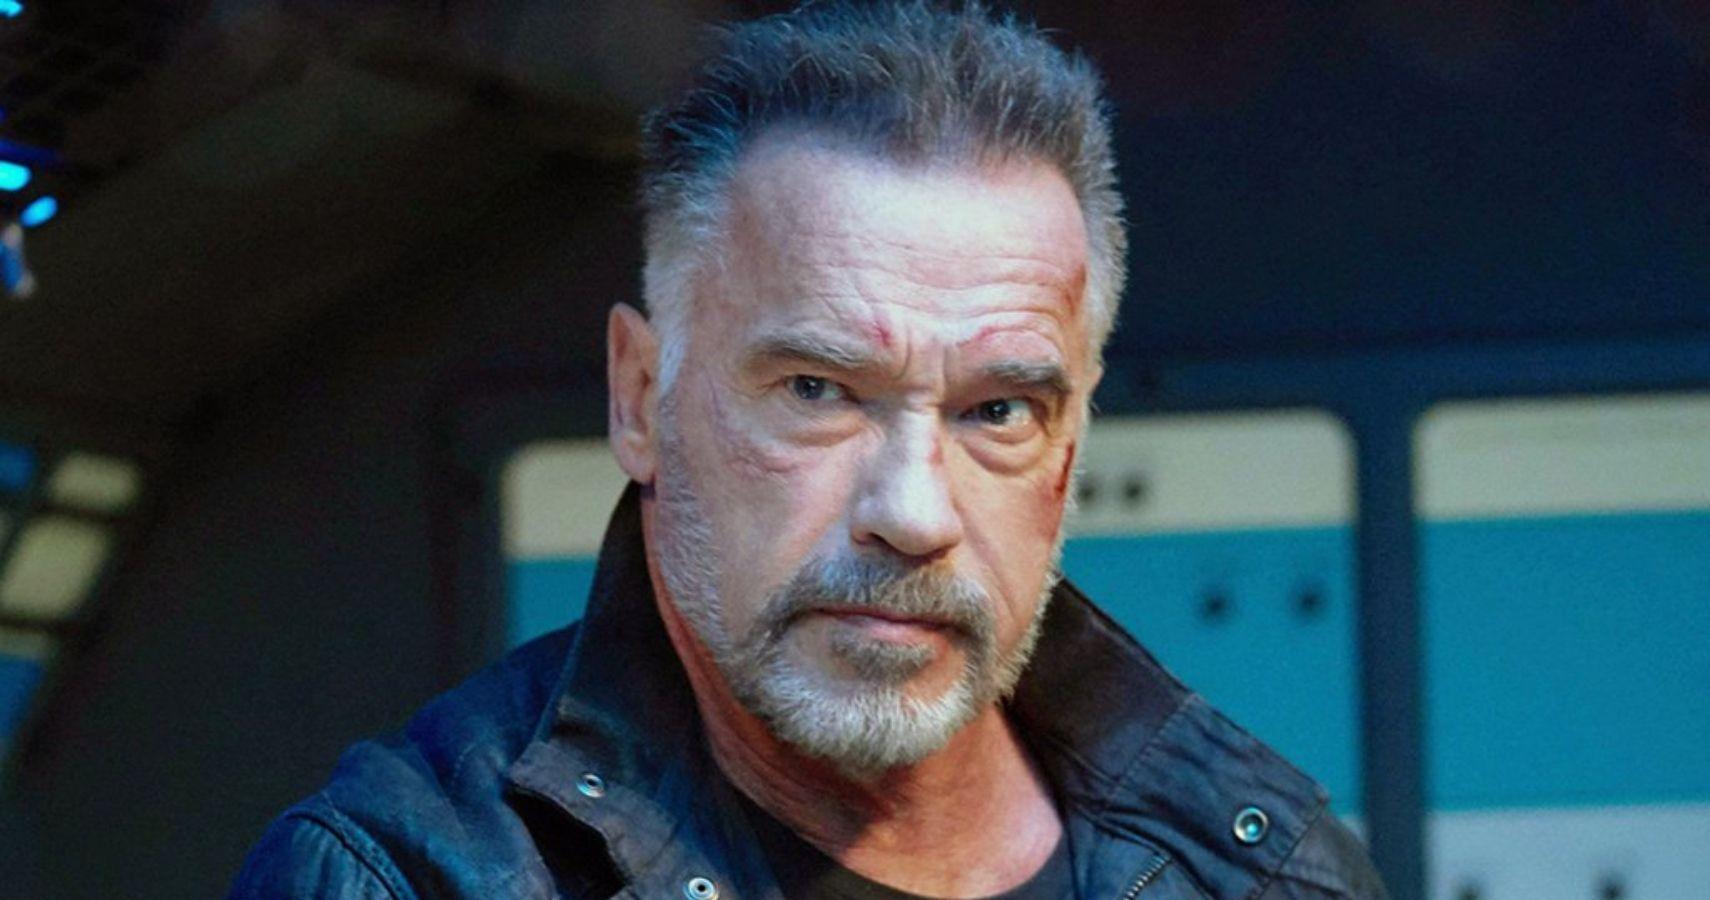 Arnold Schwarzenegger Woke Up To 2,012 California